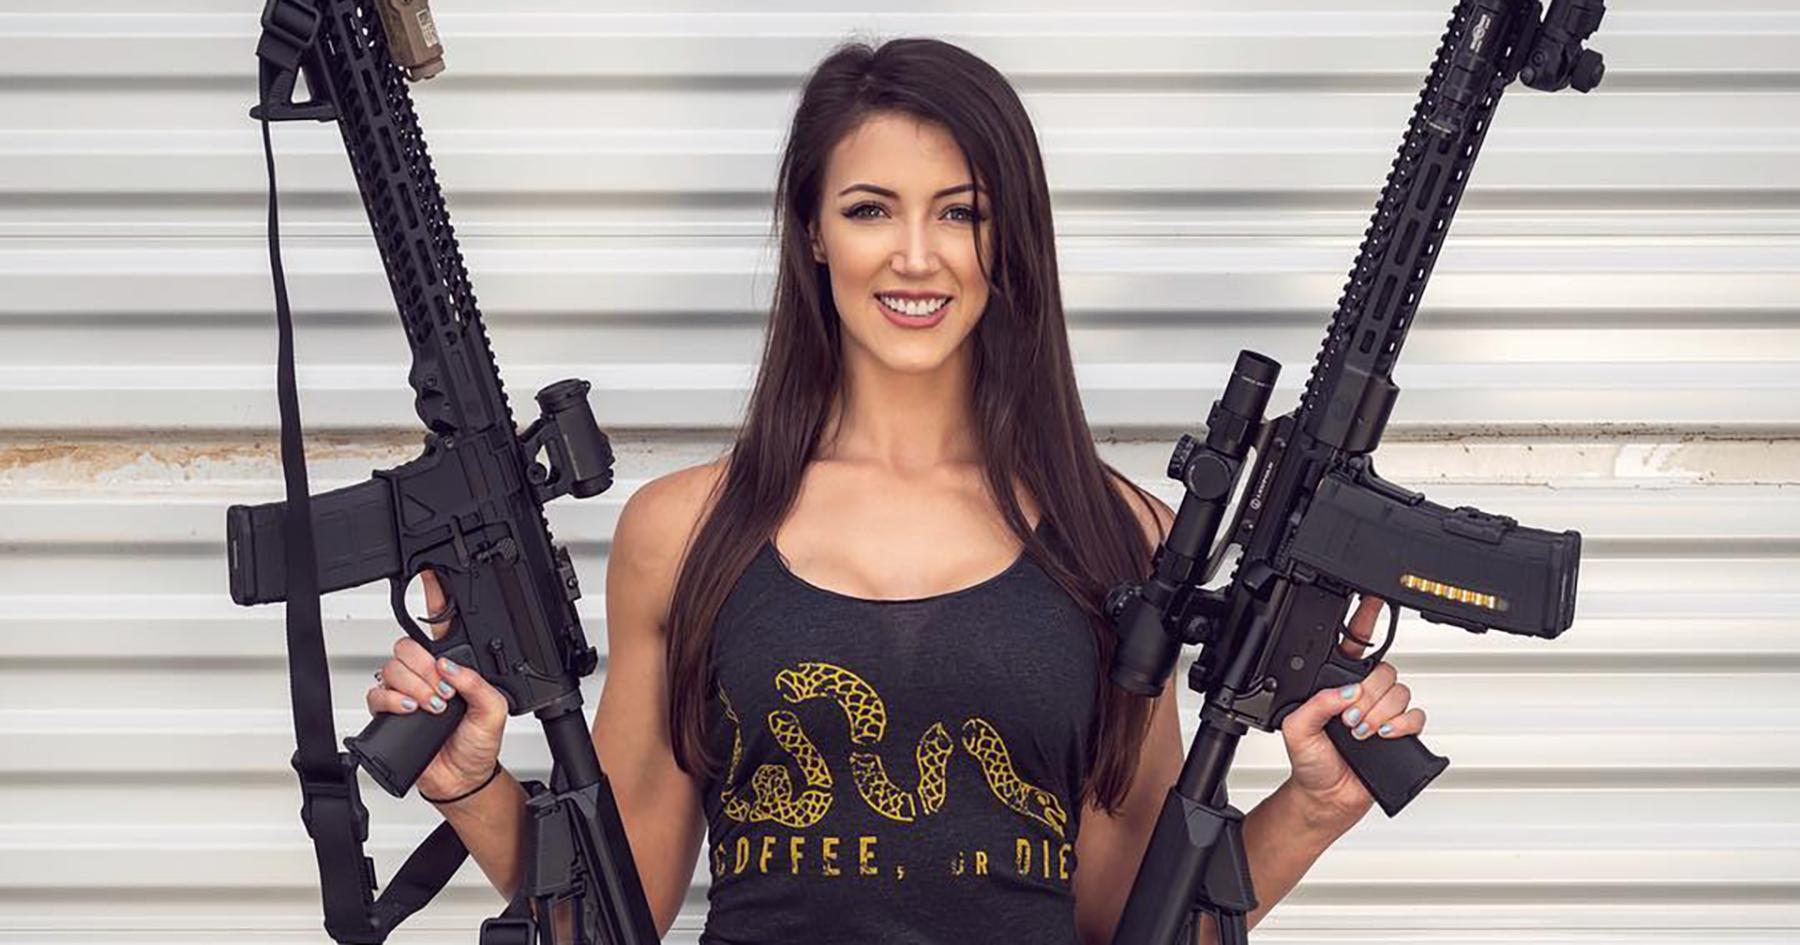 Lauren Young, one of the gun influencers taking over Instagram